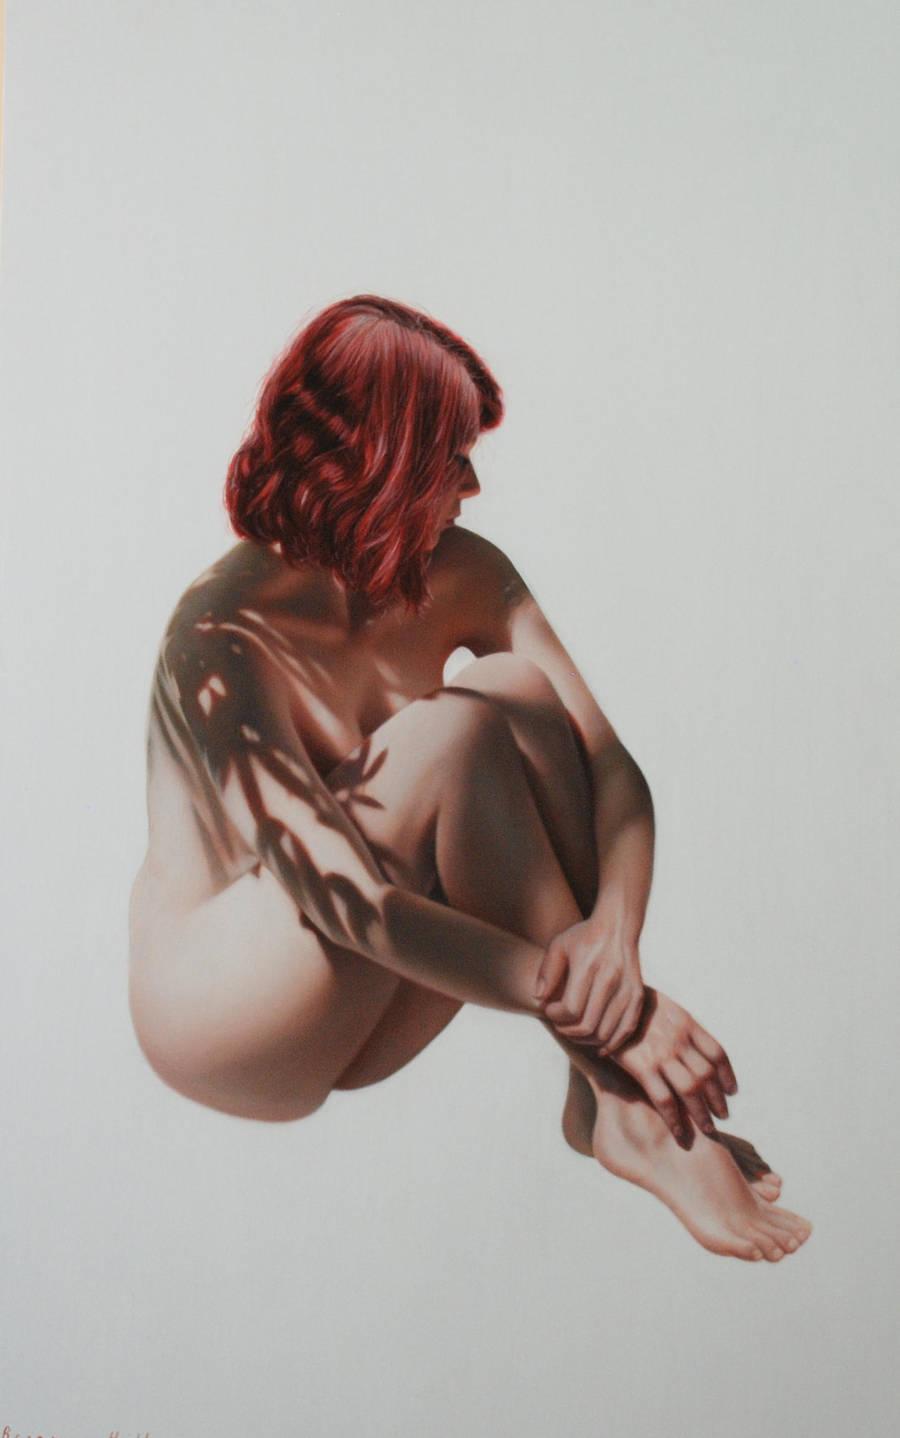 Untitled by bronart